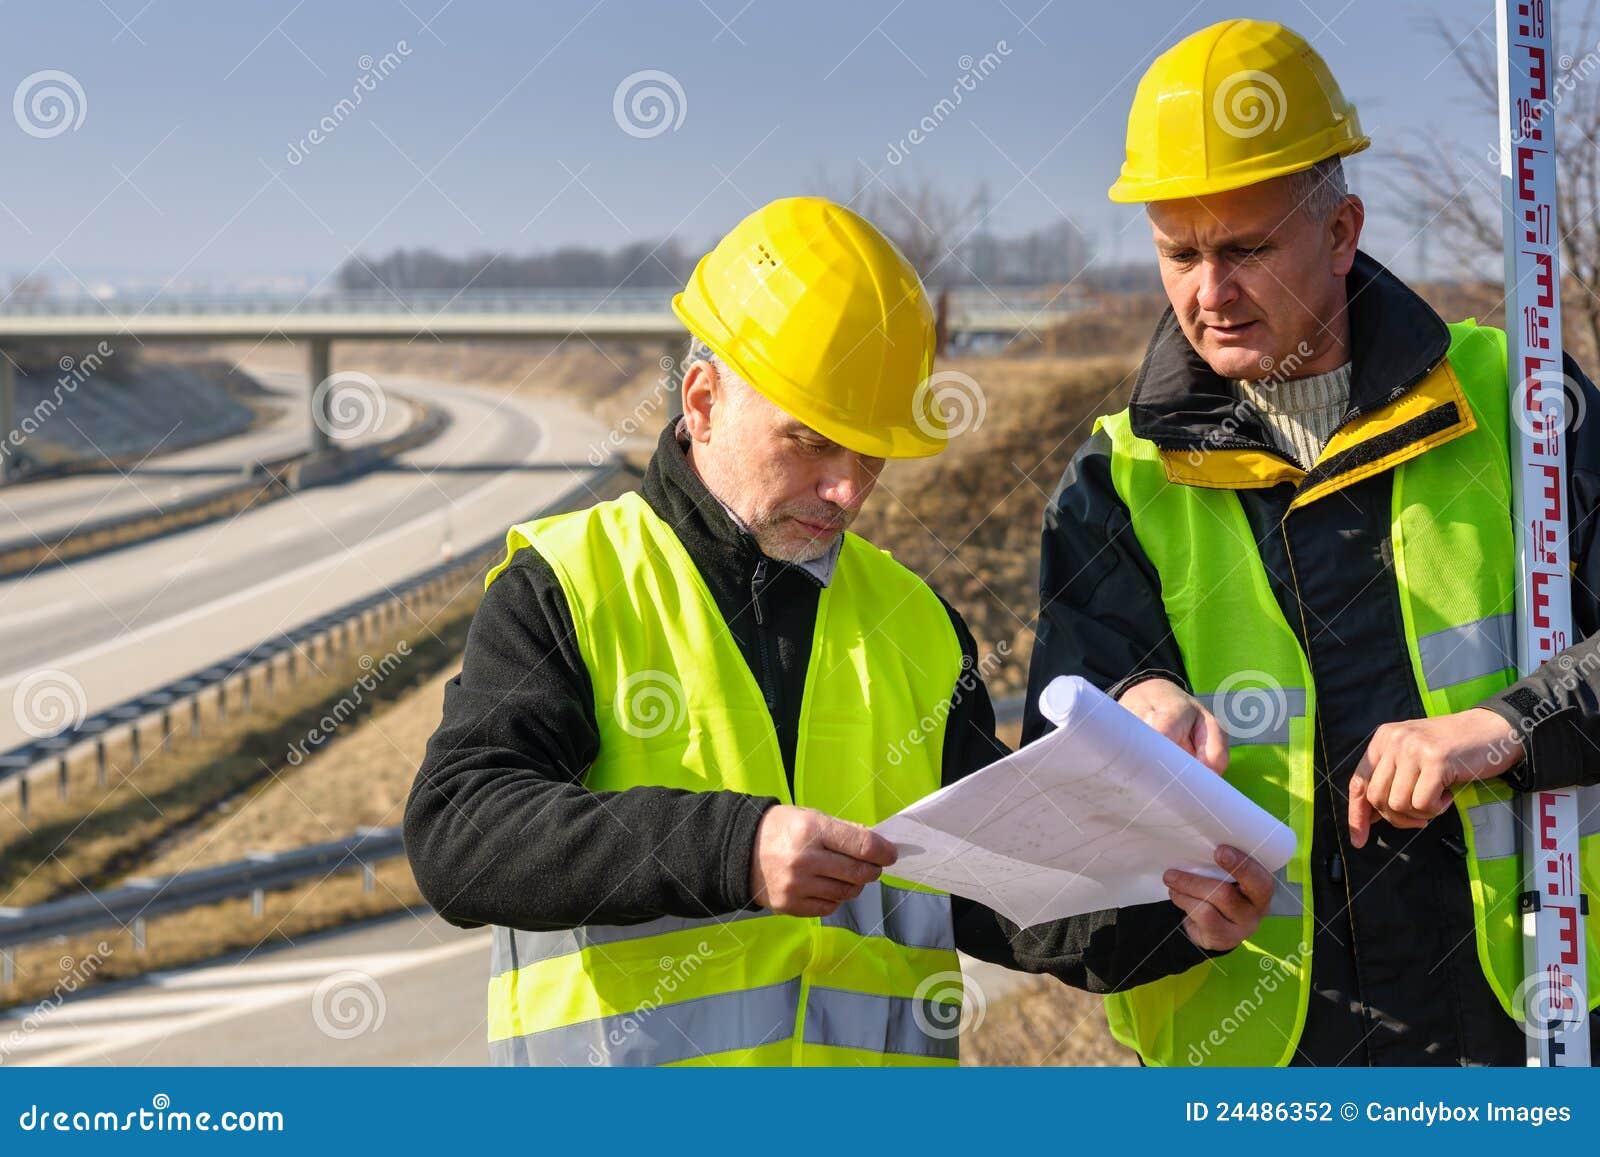 Geodesist read plans on construction site stock for How to read construction site plans